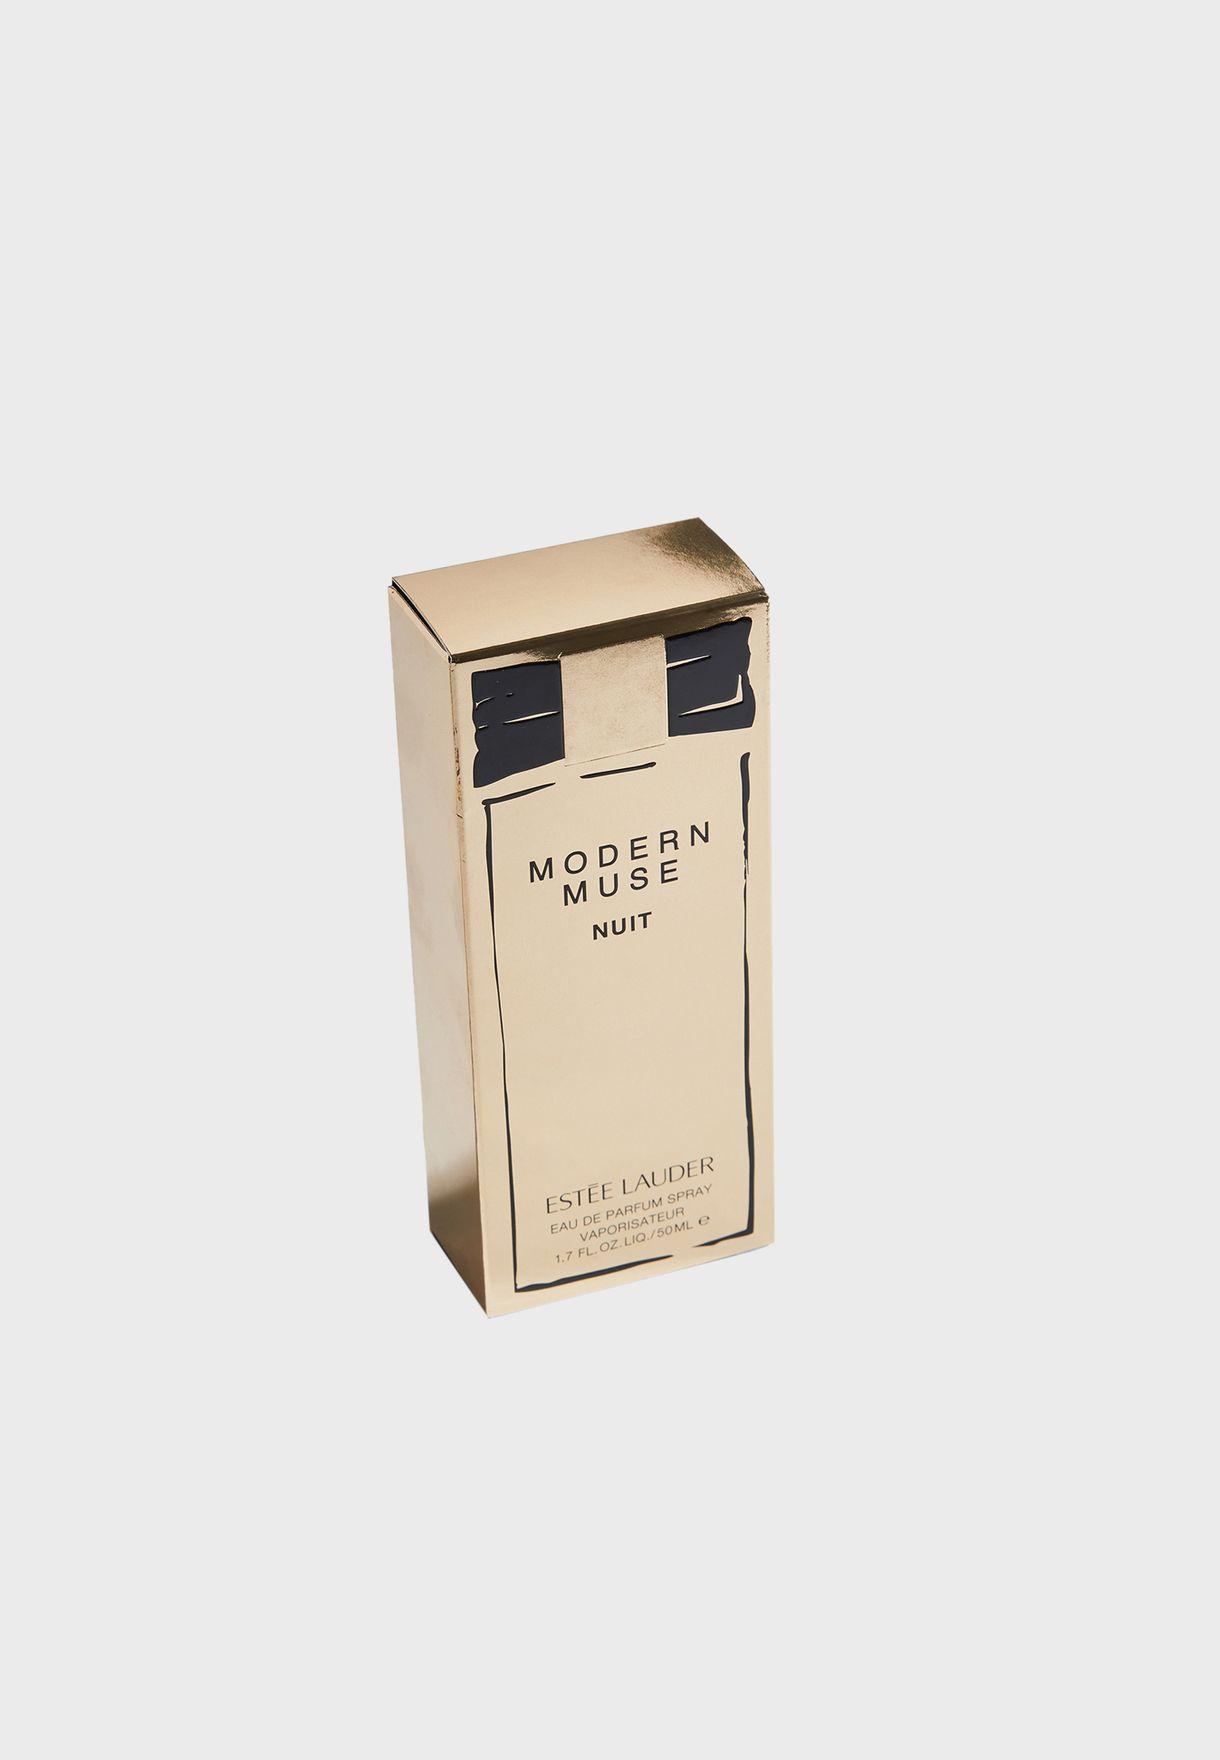 Modern Muse Nuit Edp 50ml